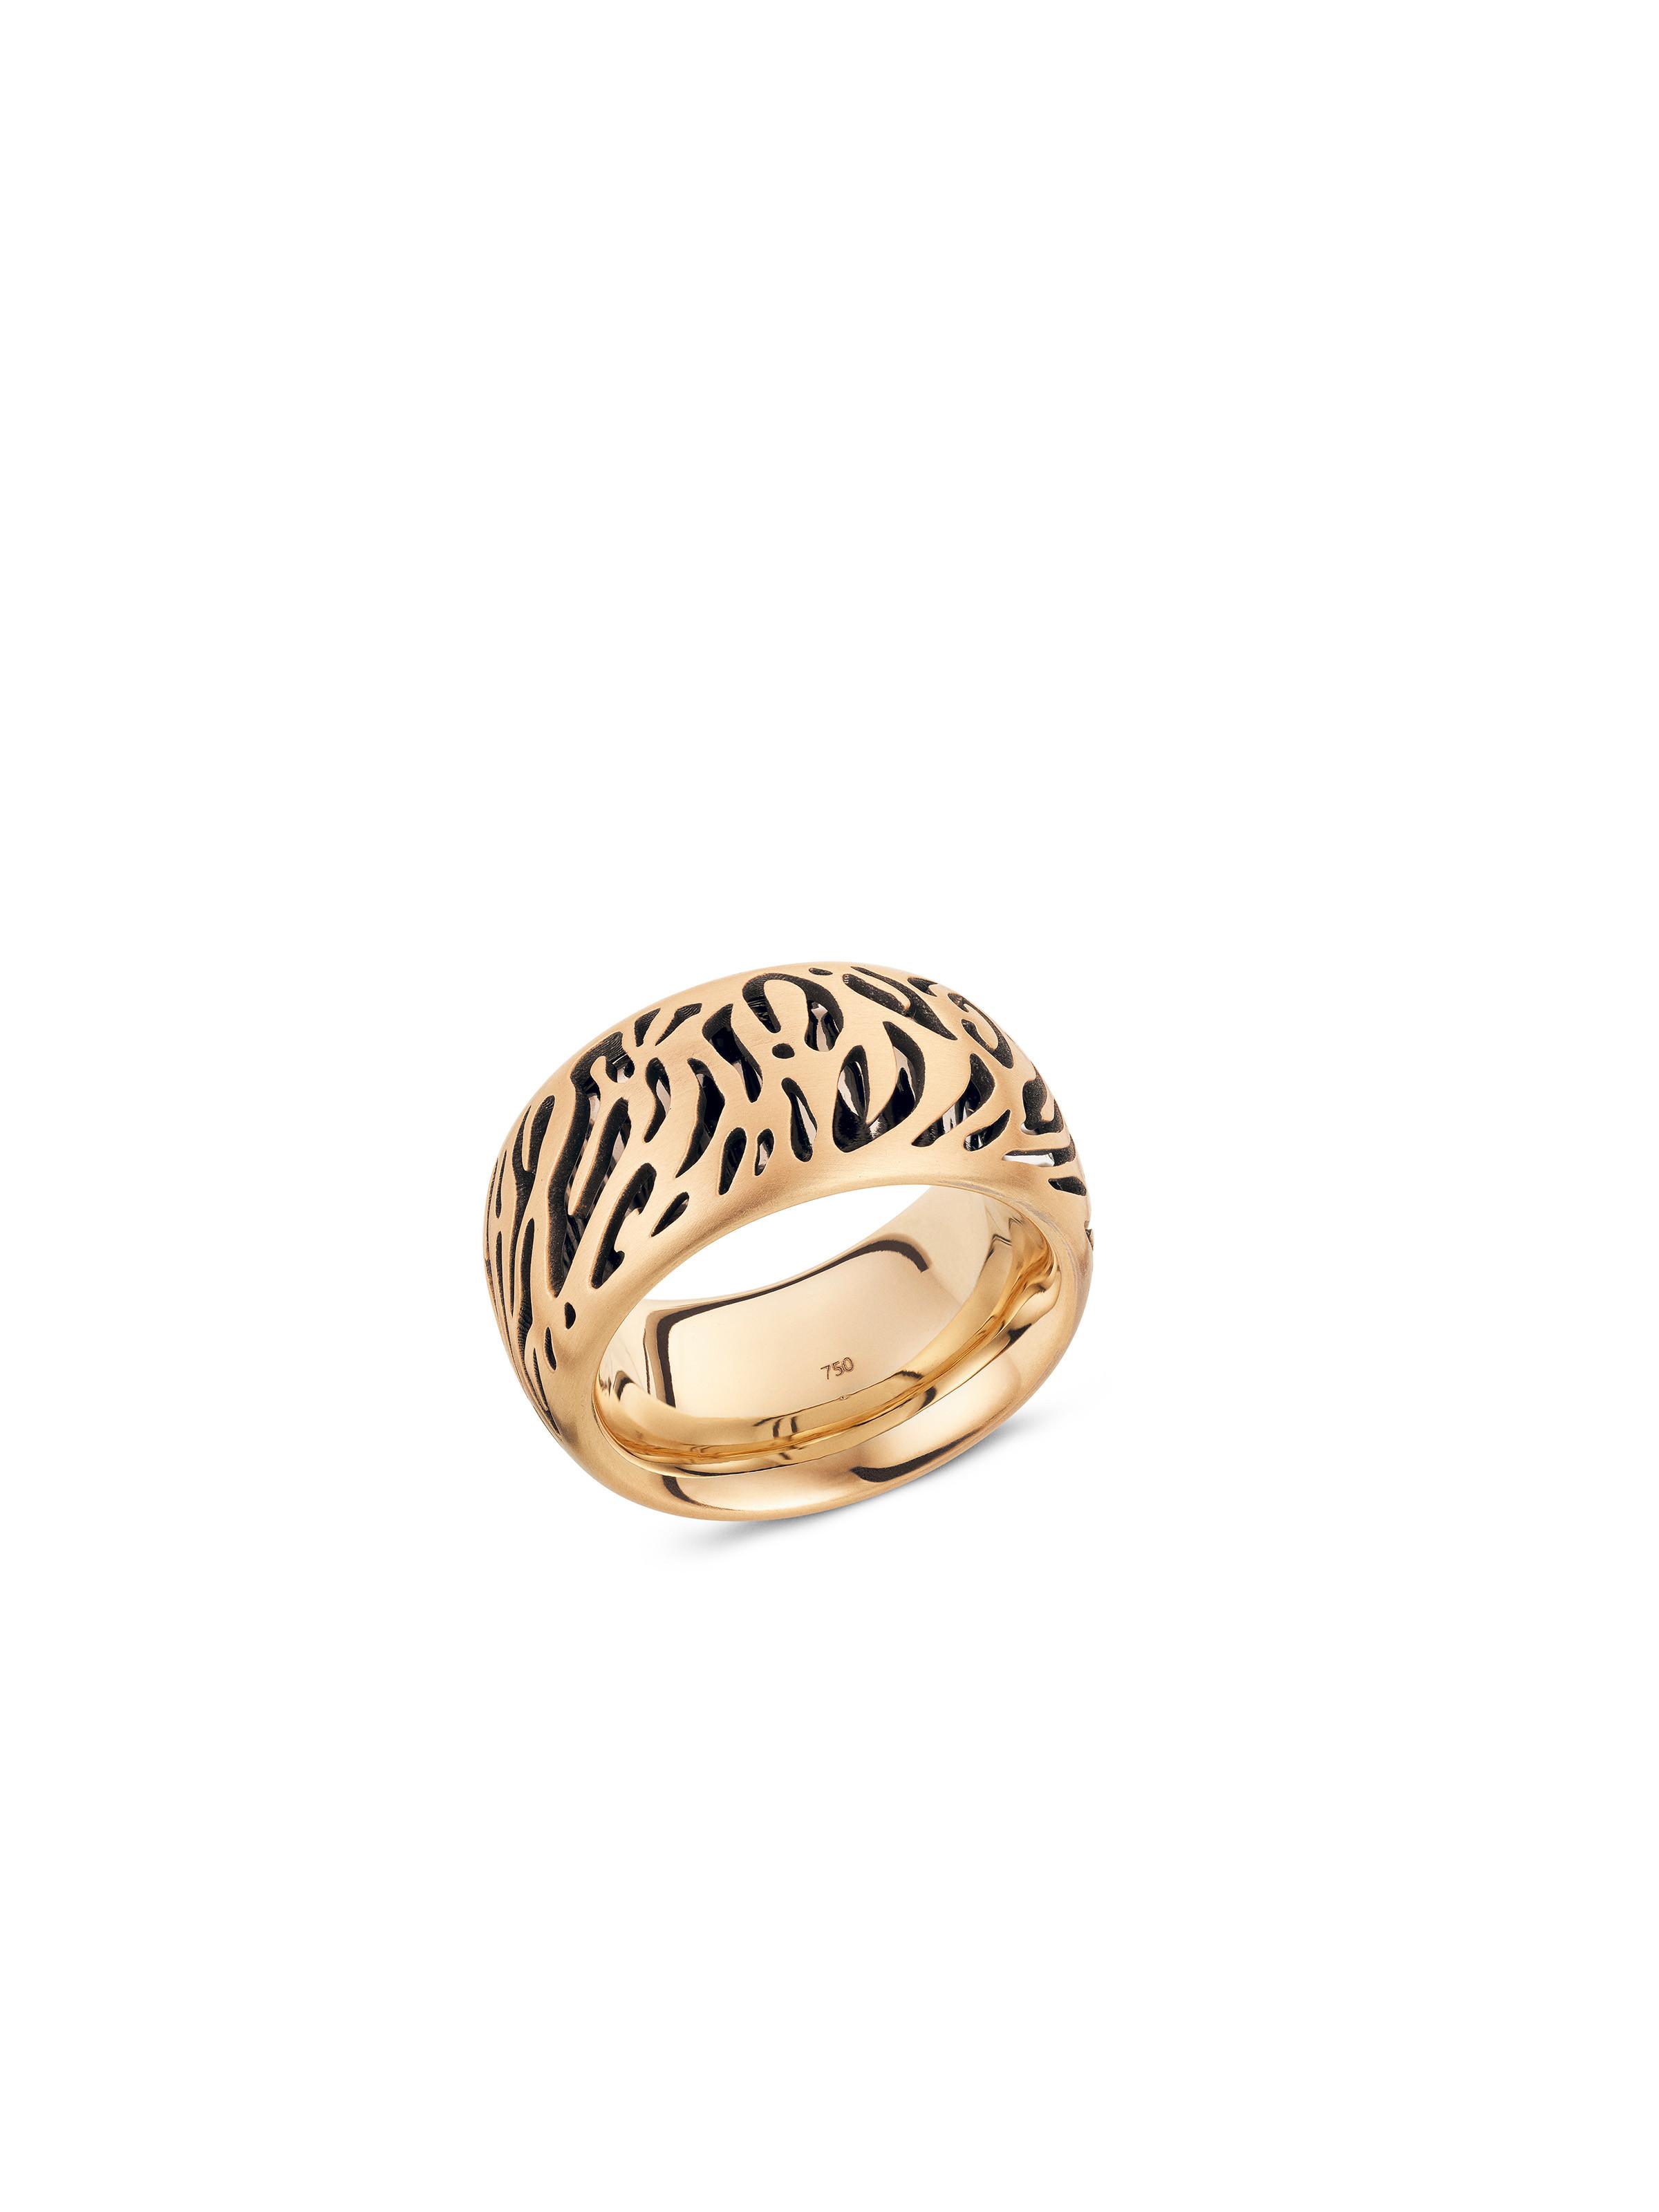 Ring Sensual Safari Tiger